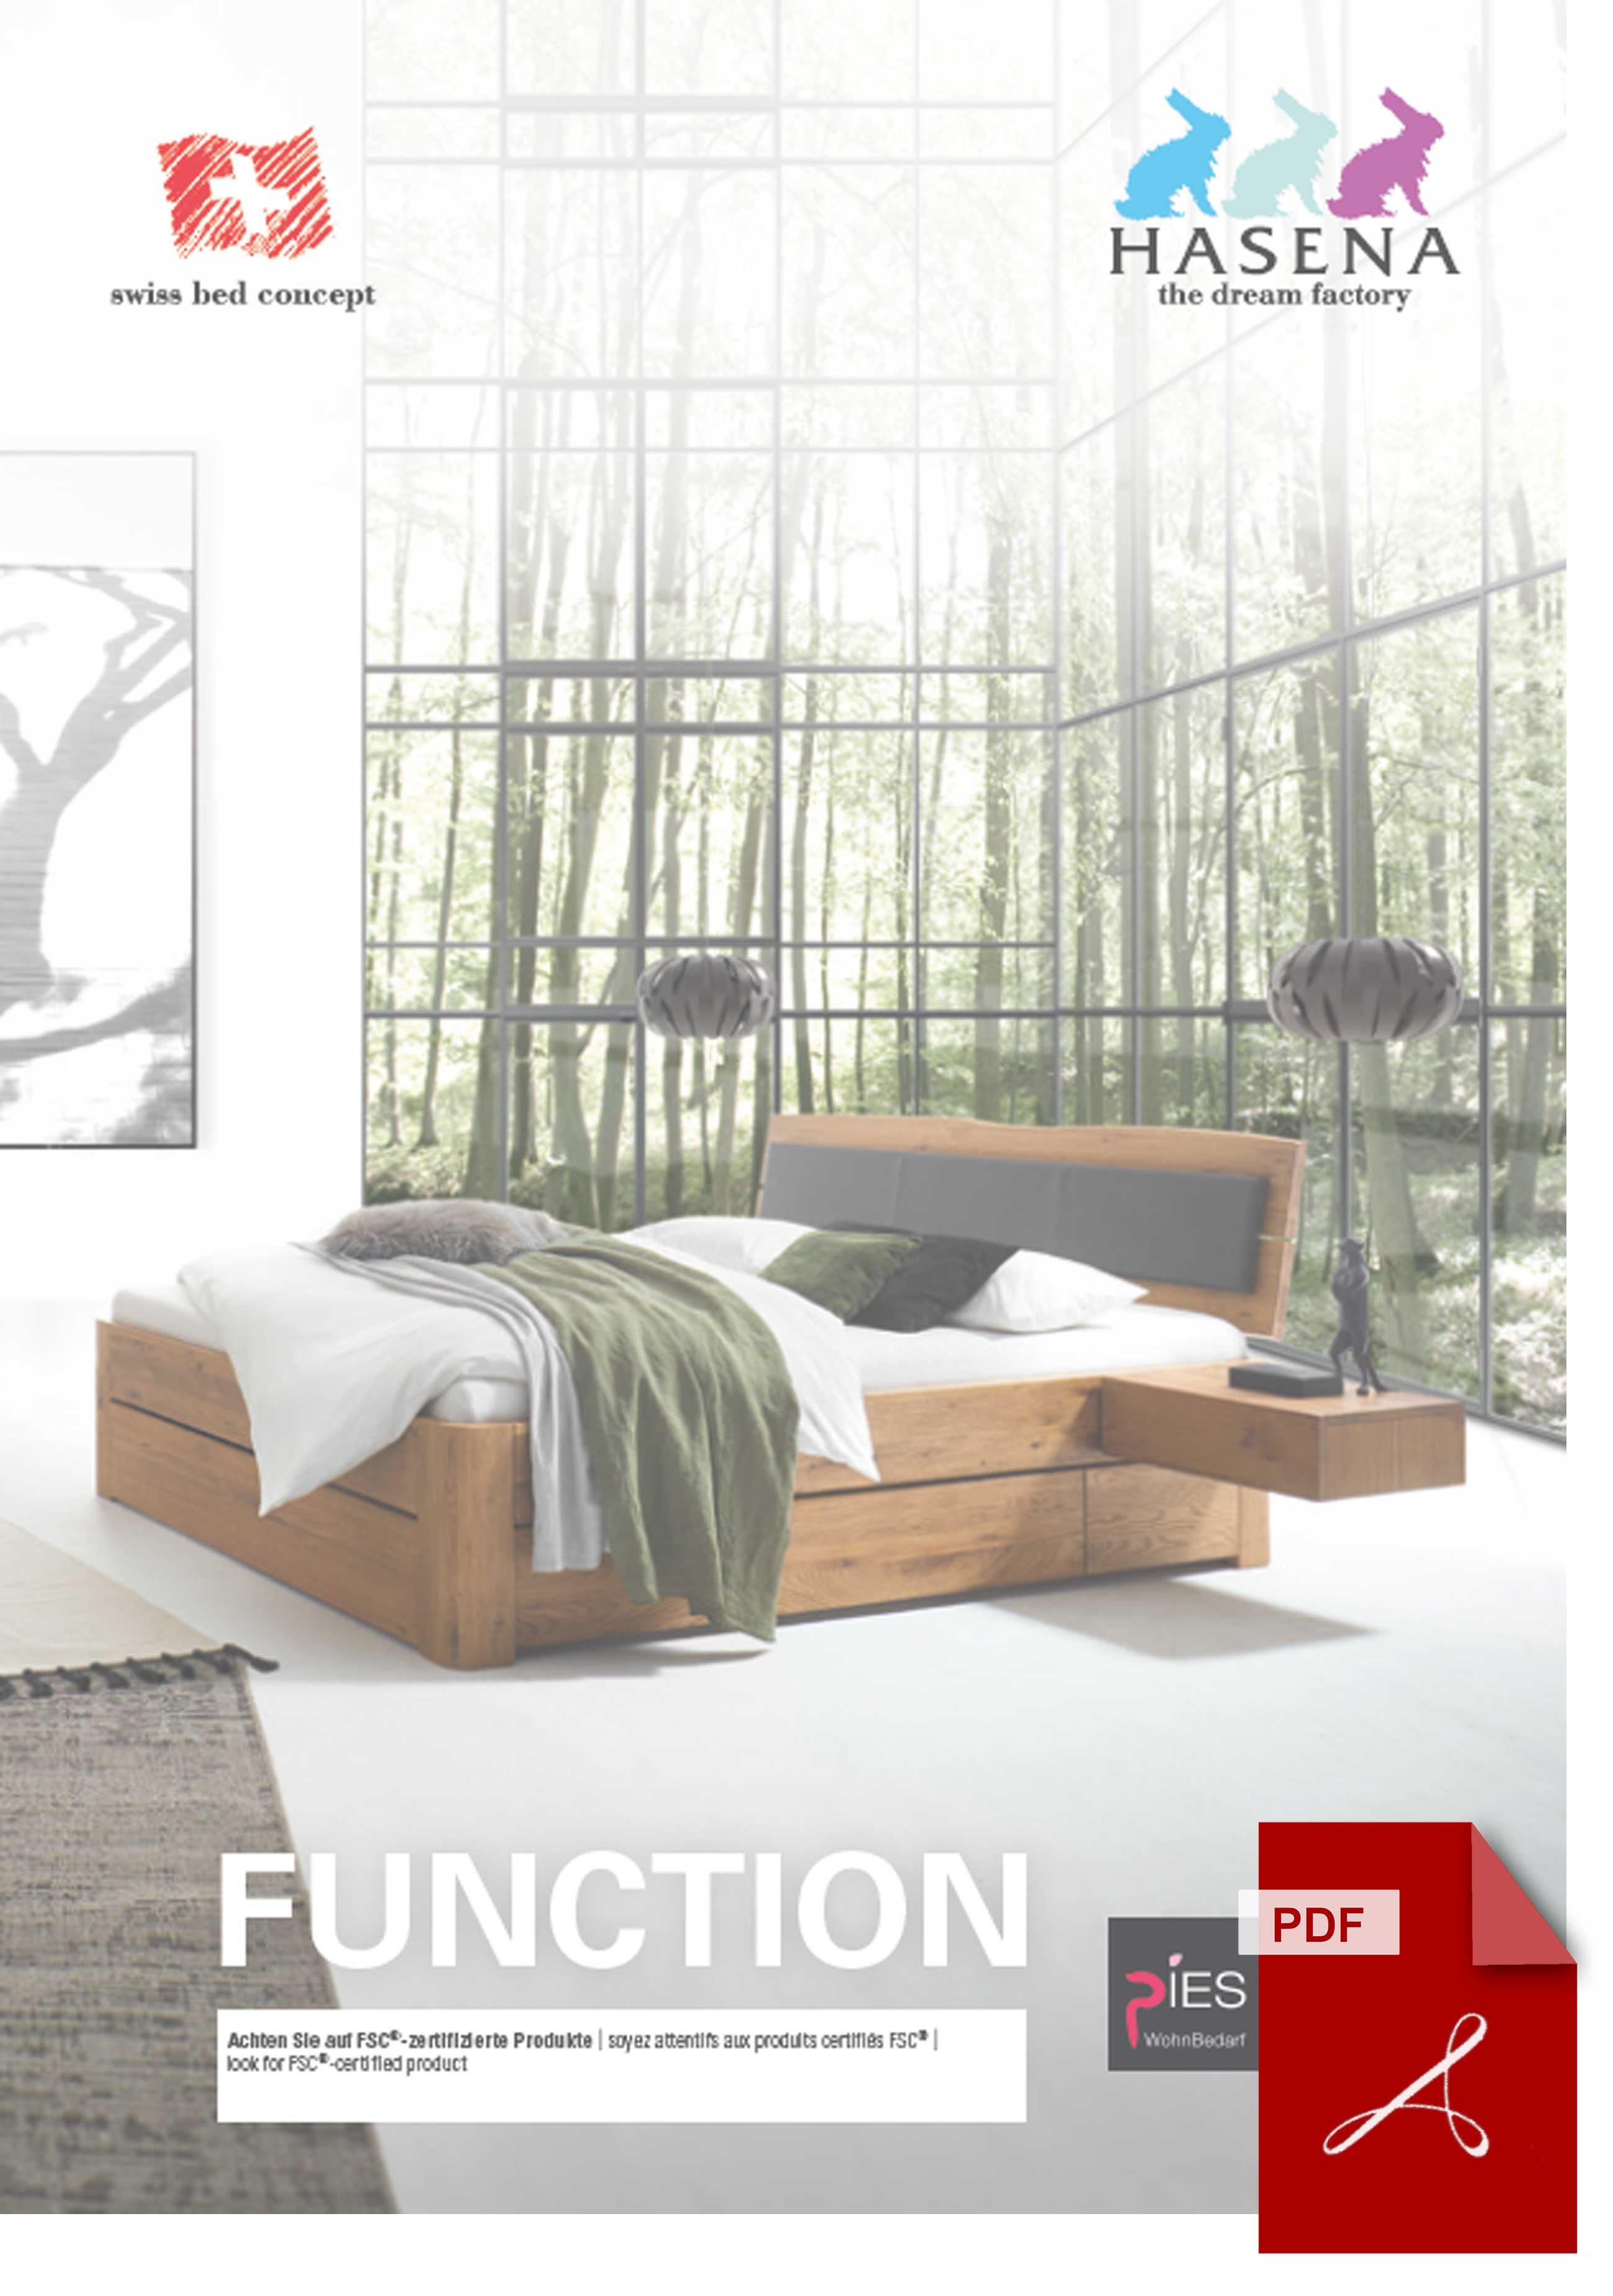 Hasena Function & Comfort Katalog als PDF Datei